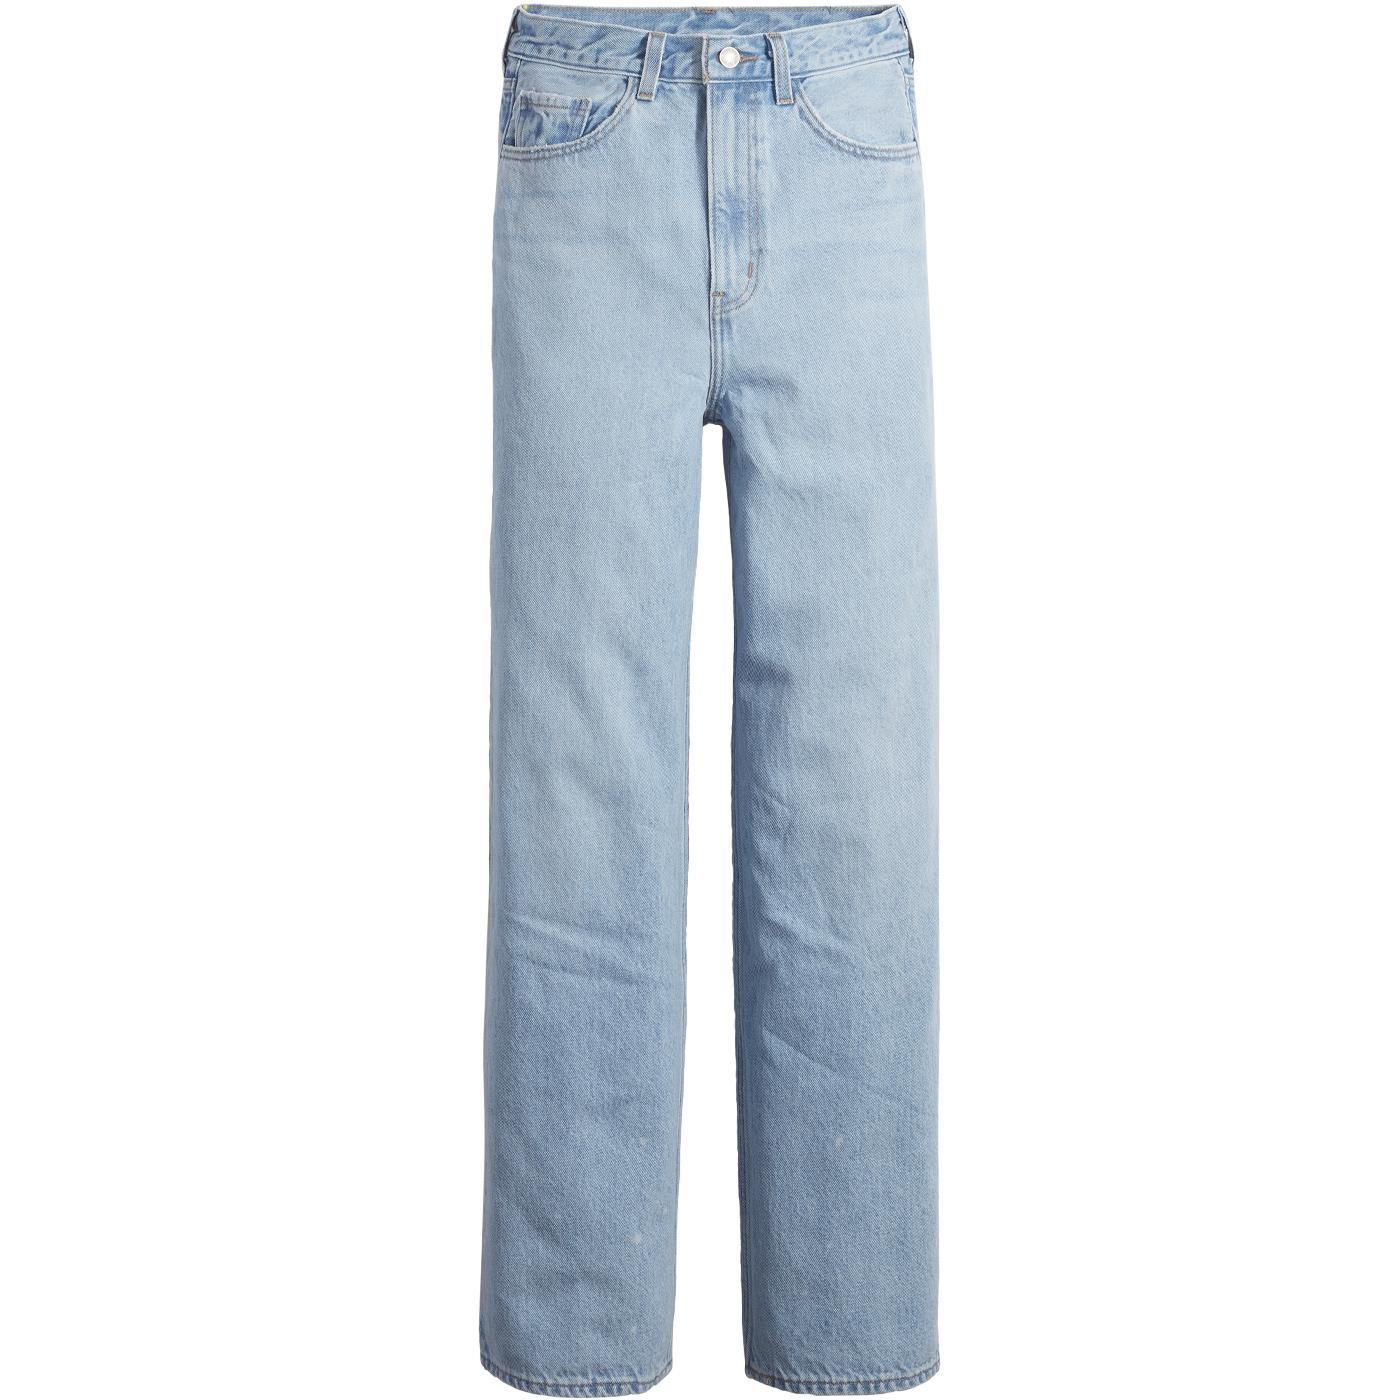 LEVI'S Women's Retro 90s High Loose Wide Leg Jeans